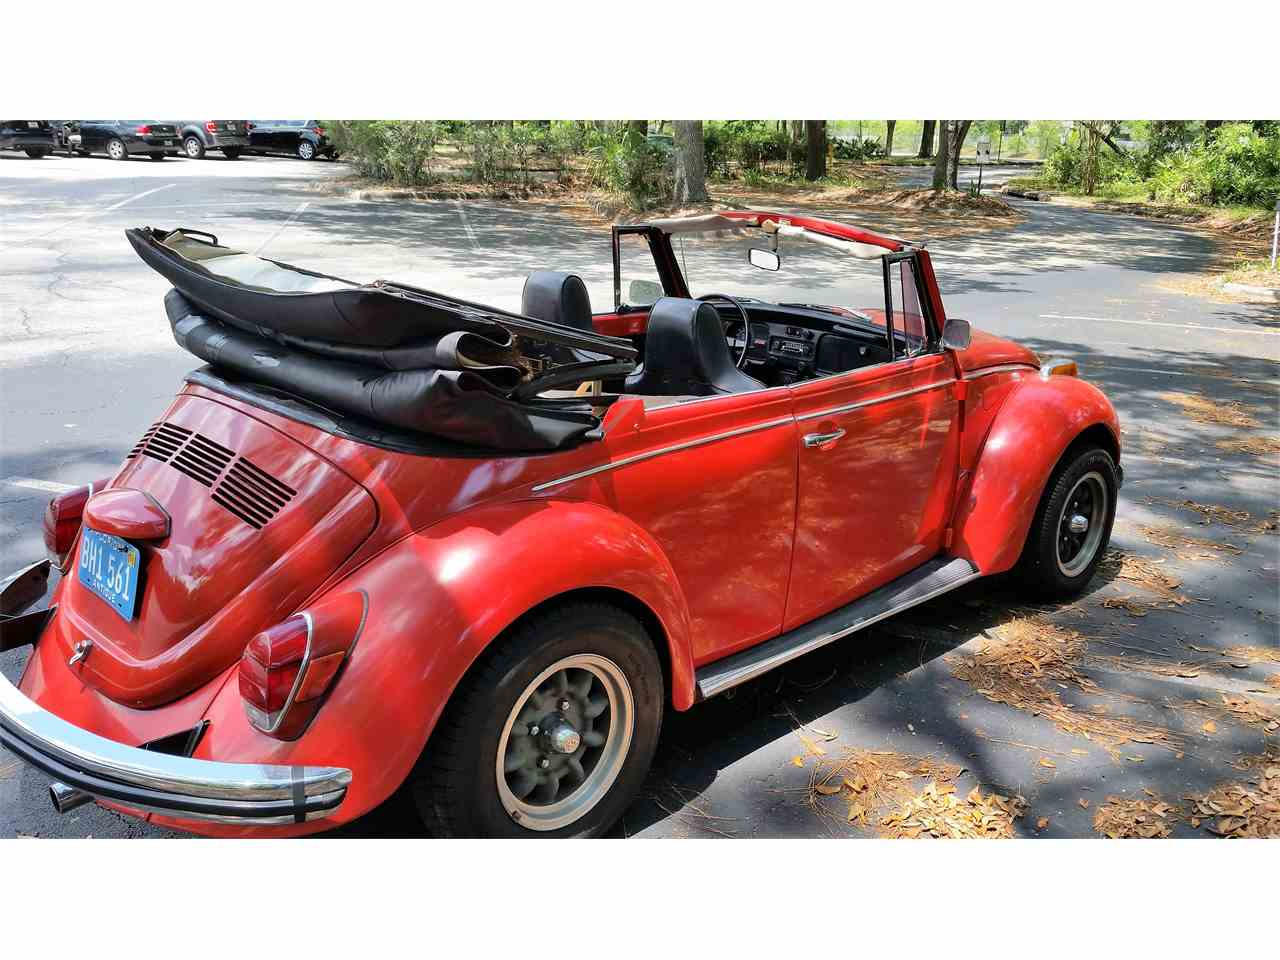 1972 Volkswagen Super Beetle for Sale | ClassicCars.com | CC-1003402